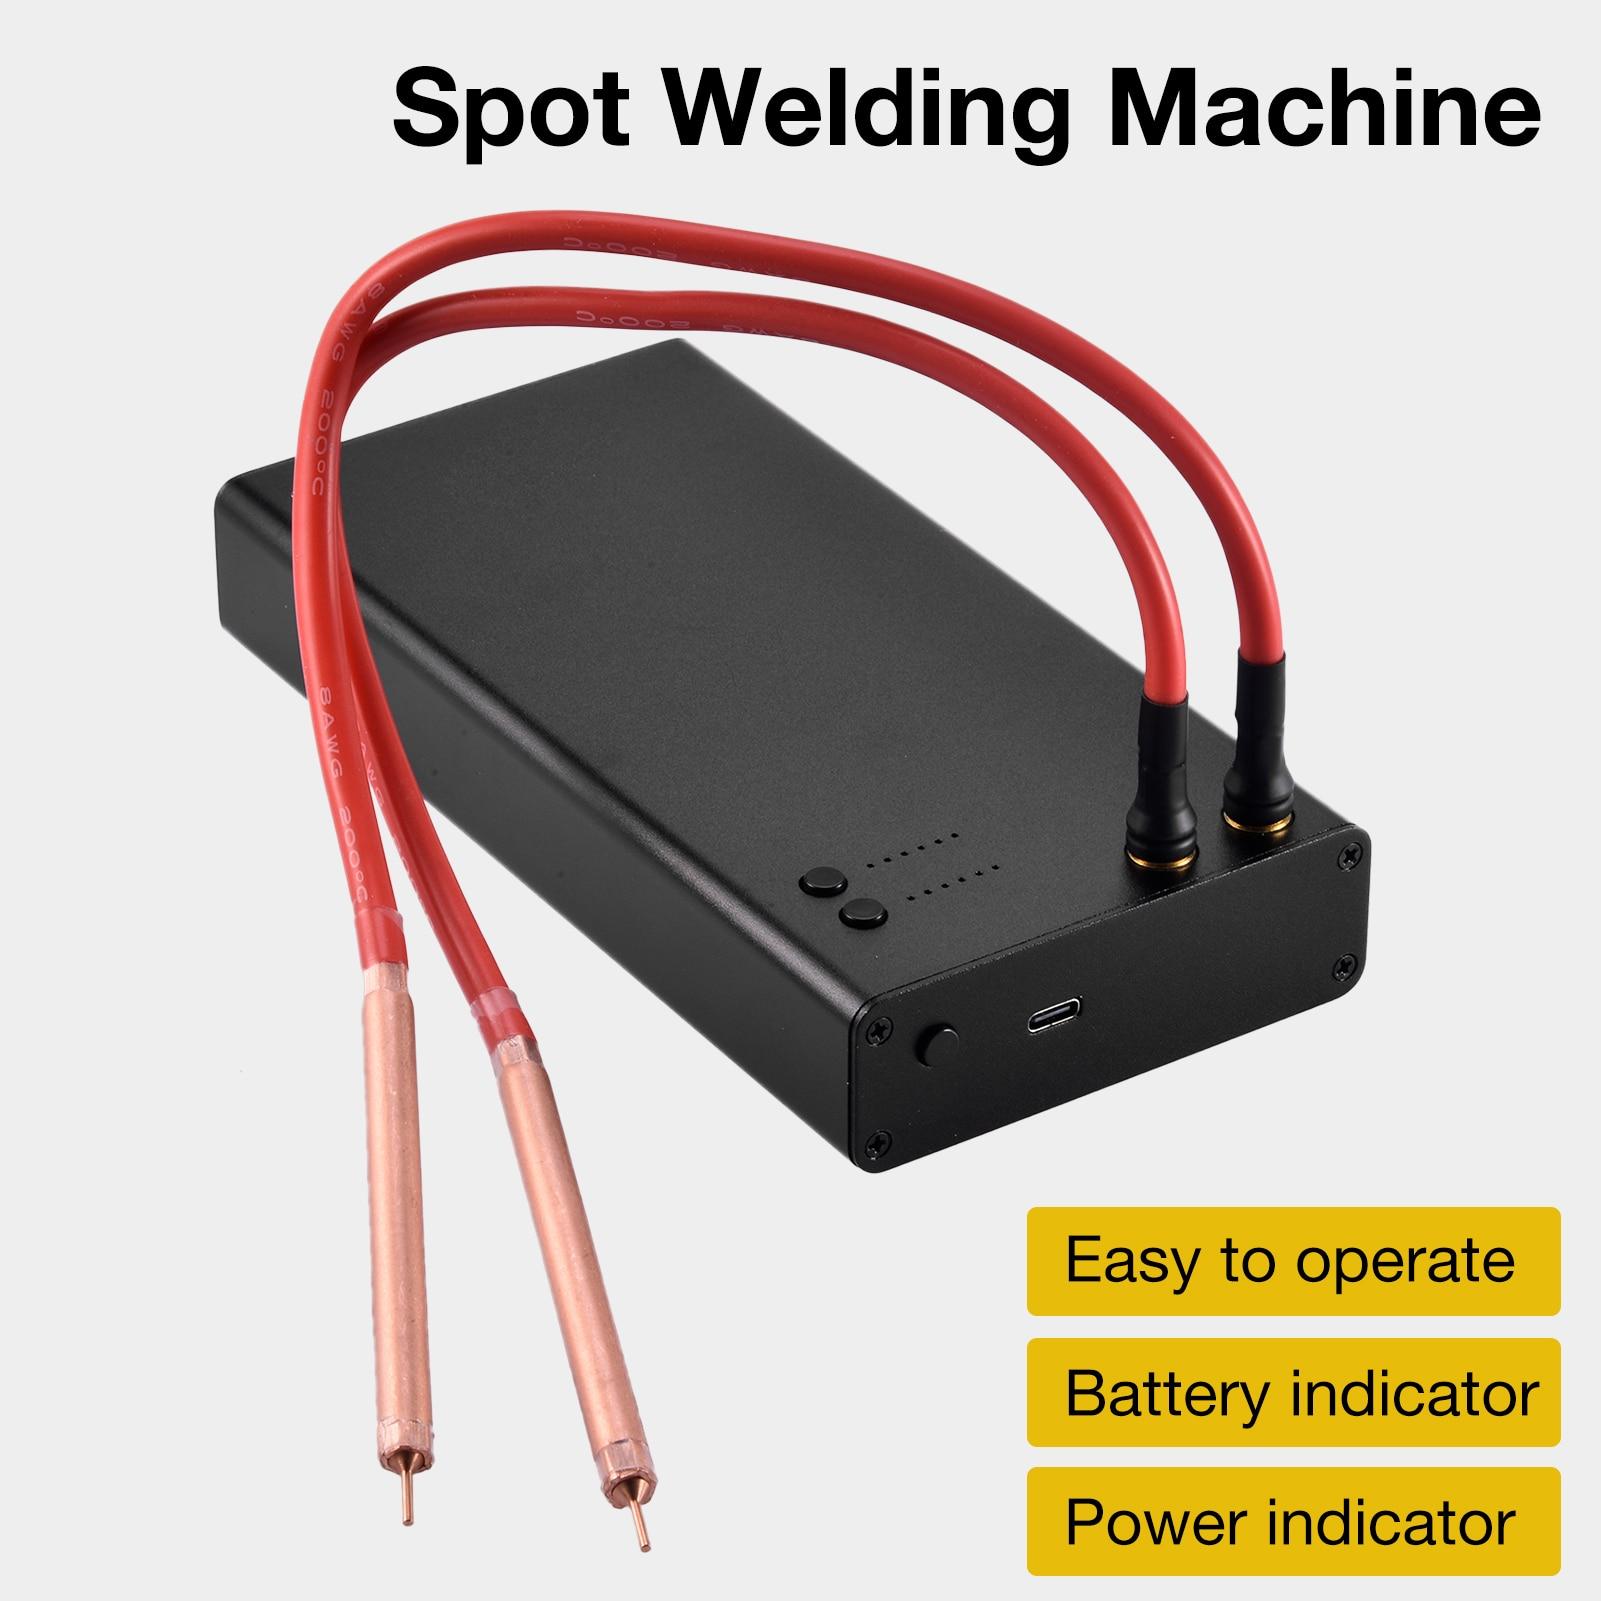 6 Gears Adjustable Mini Spot Welding Machine With Type-C Interface Quick-Release Pens Portable Spot Welder Machine Tool Kit